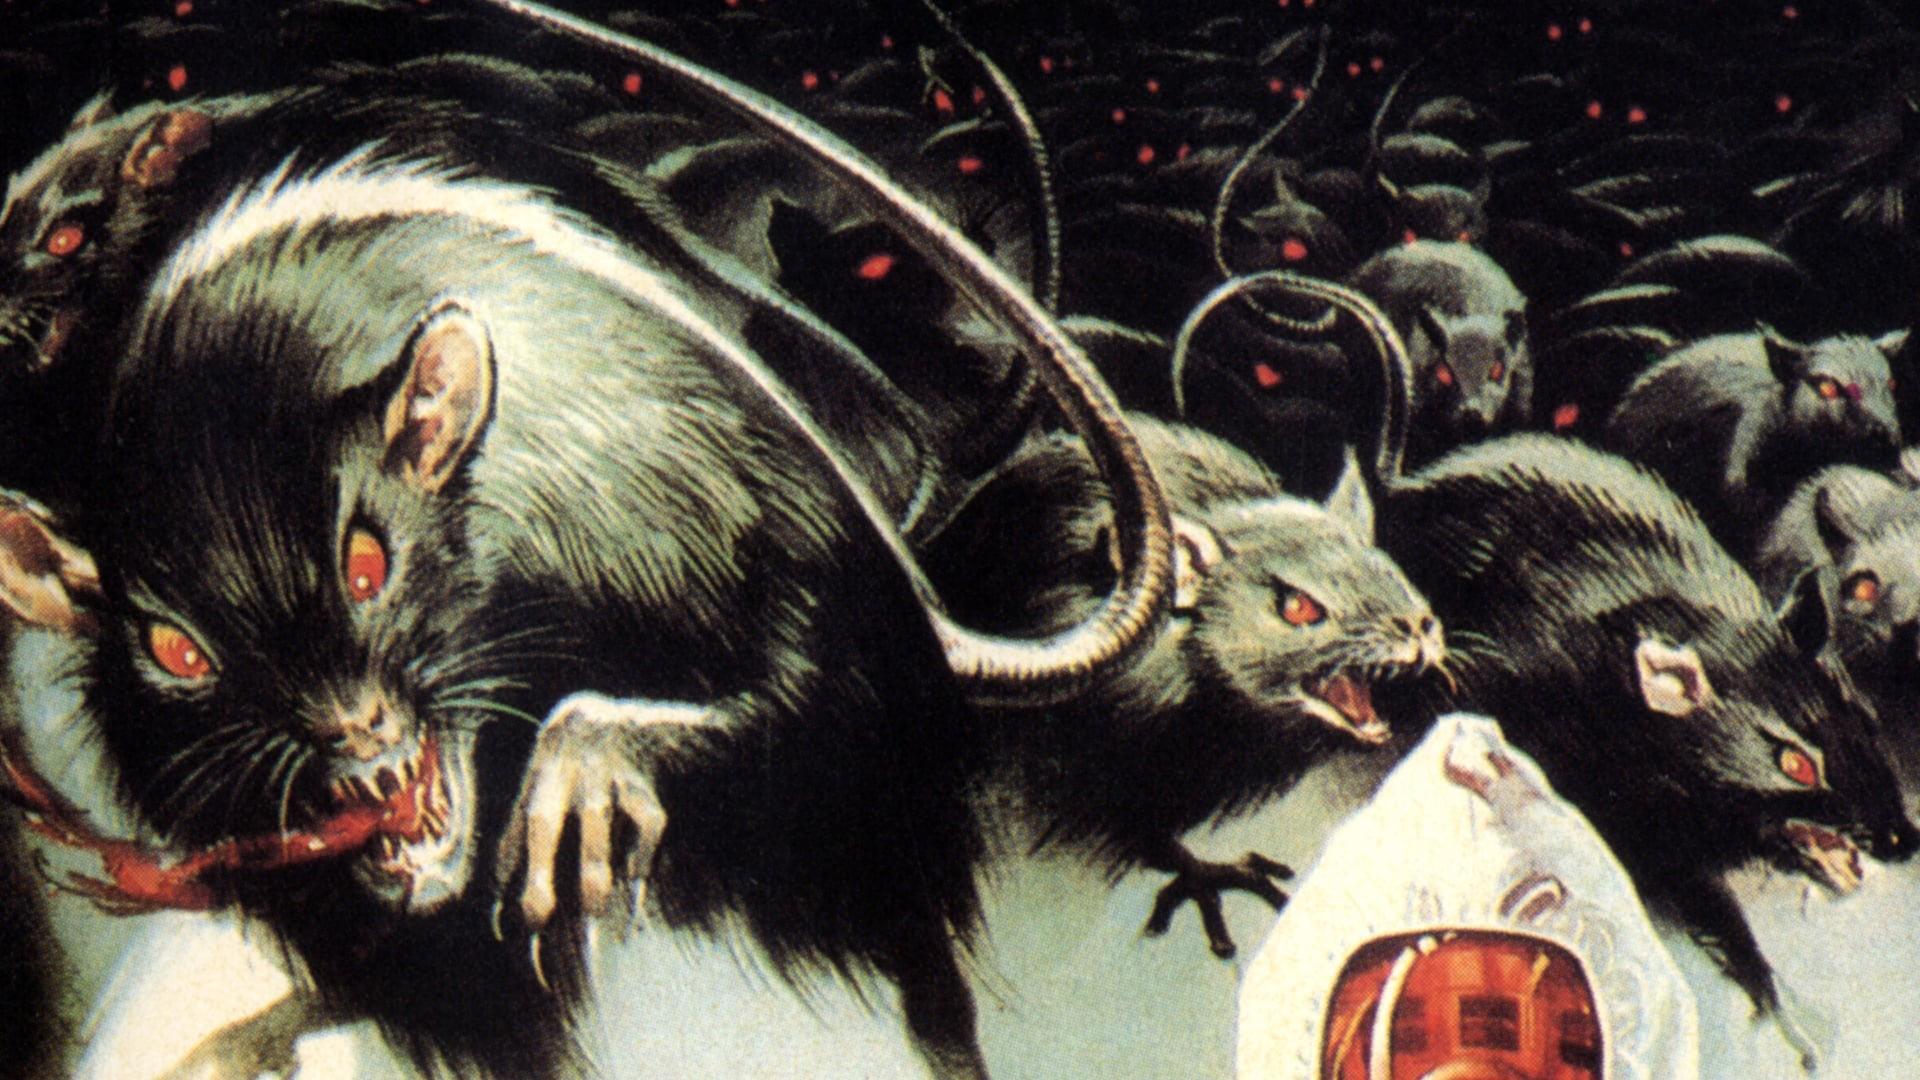 rats-notte-di-terrore--1984-1597248391.jpg